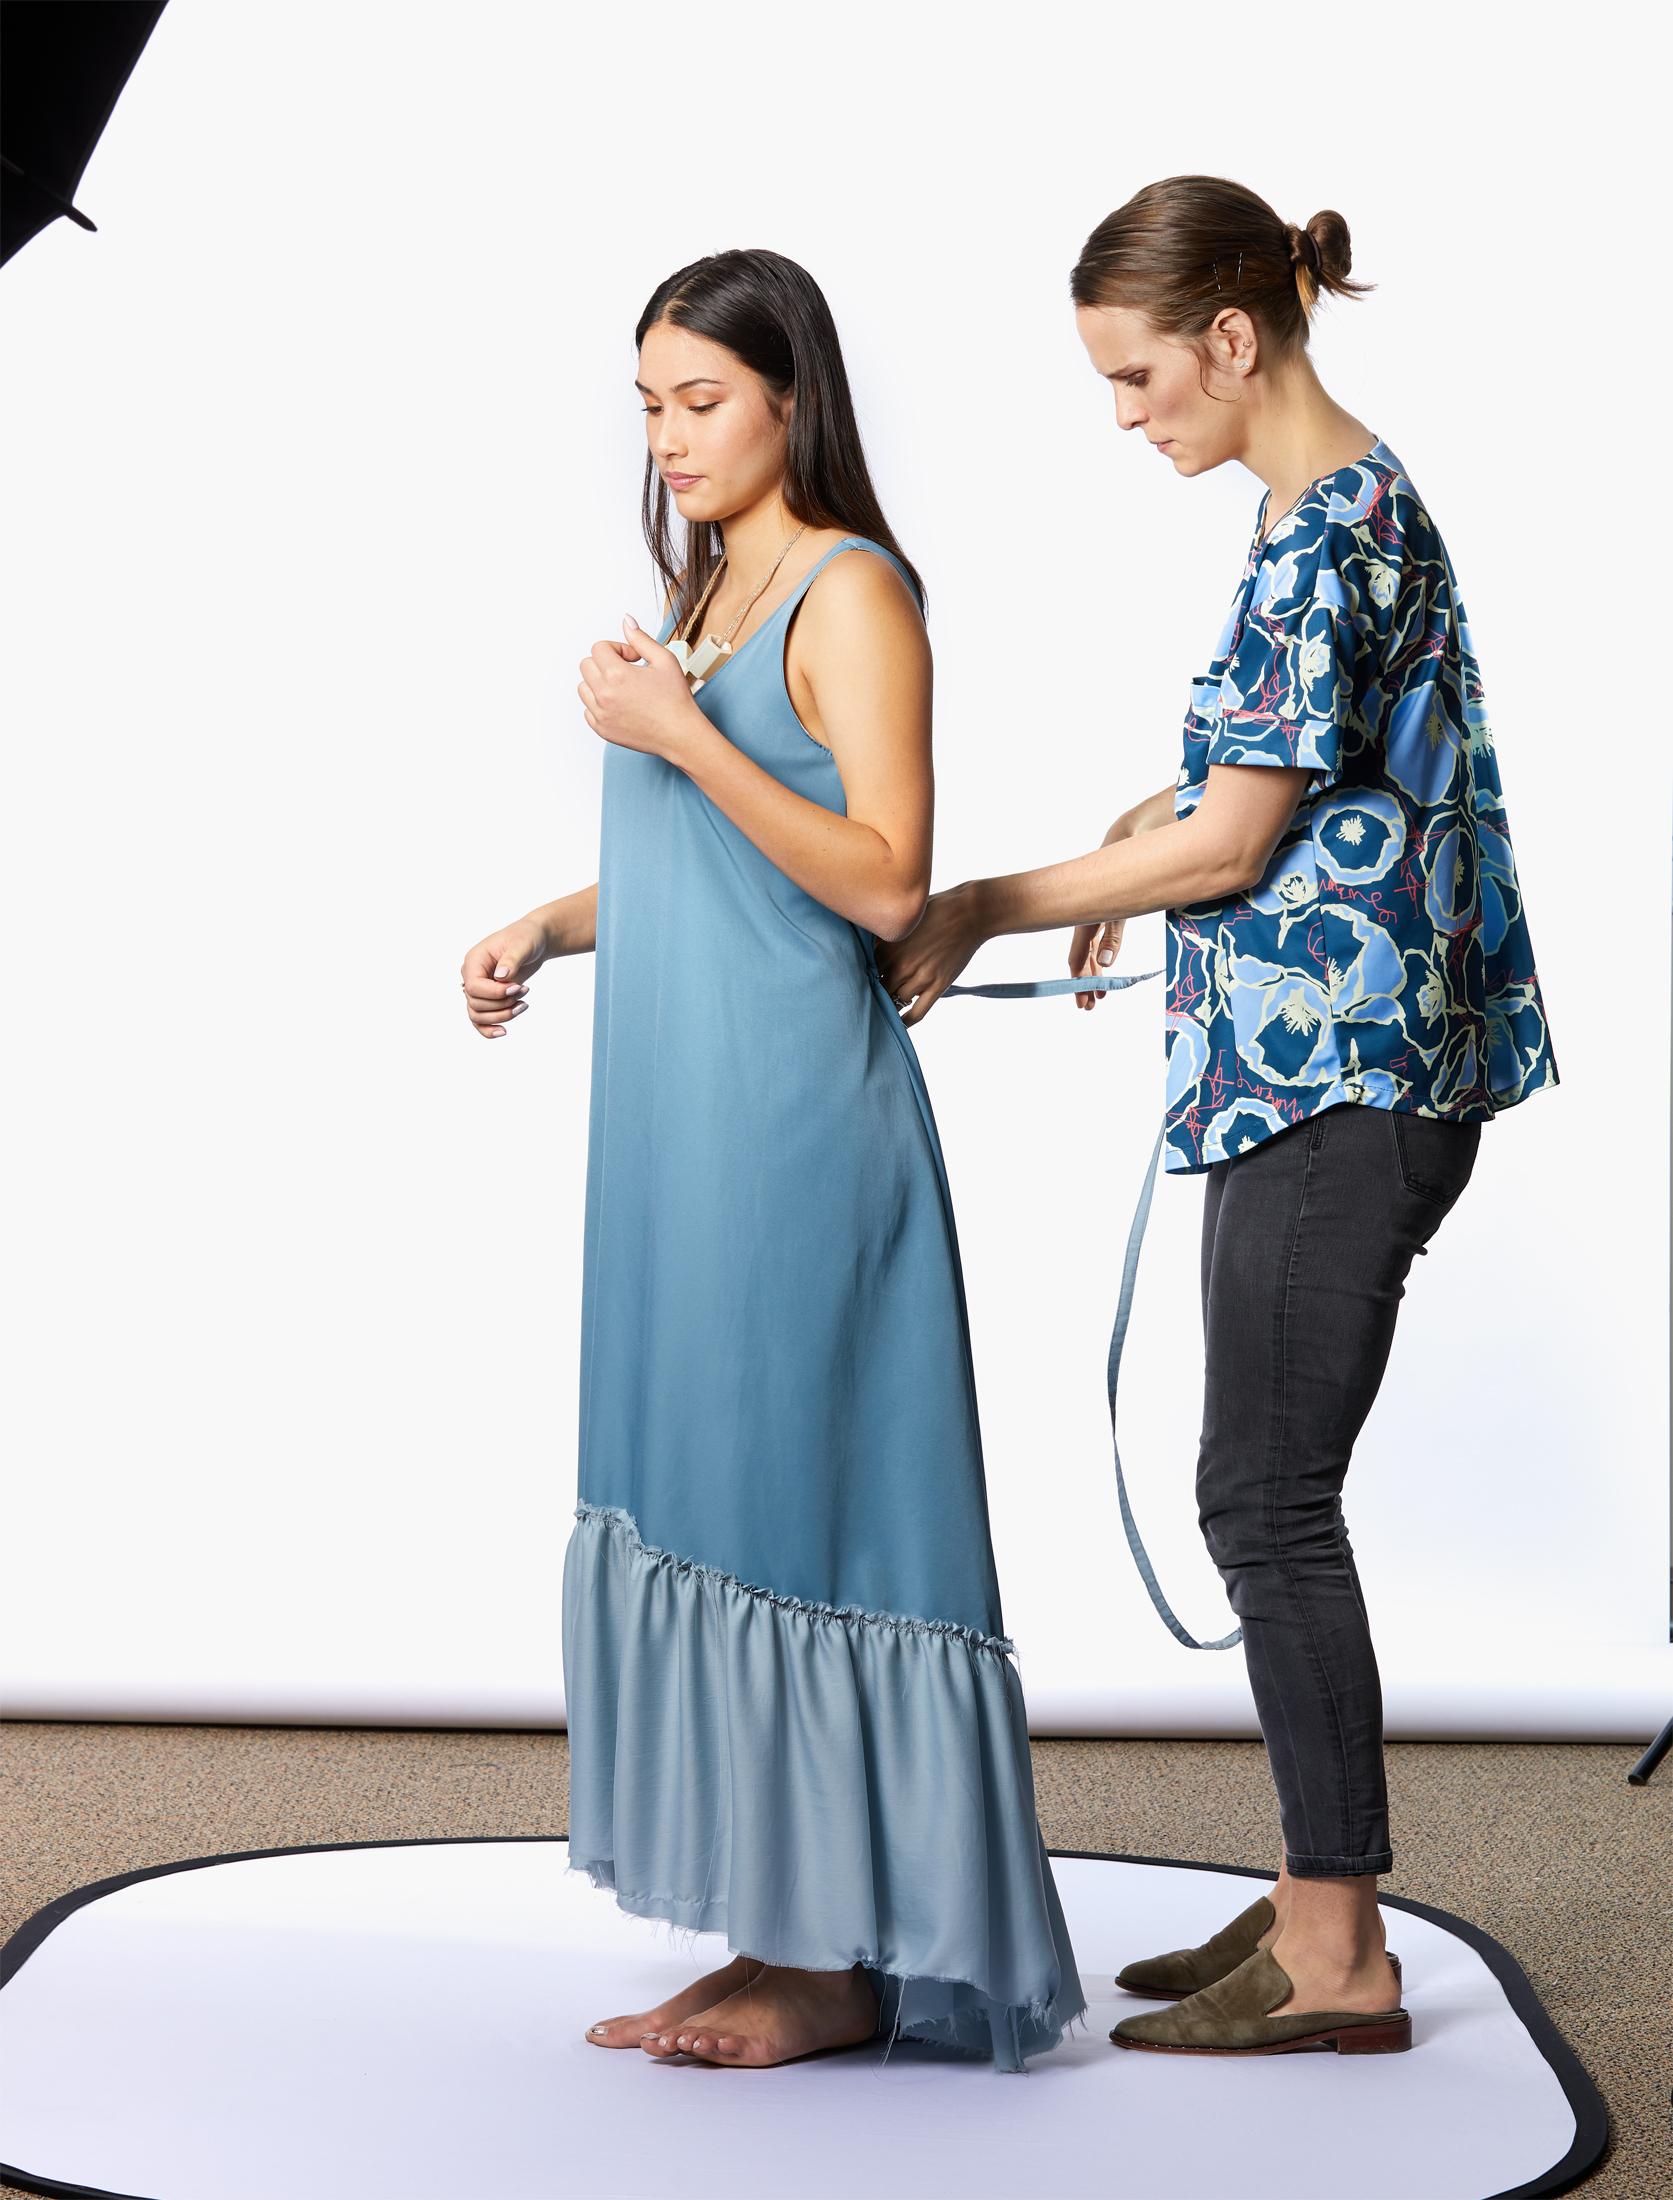 Poppyseed - adjusting the dress